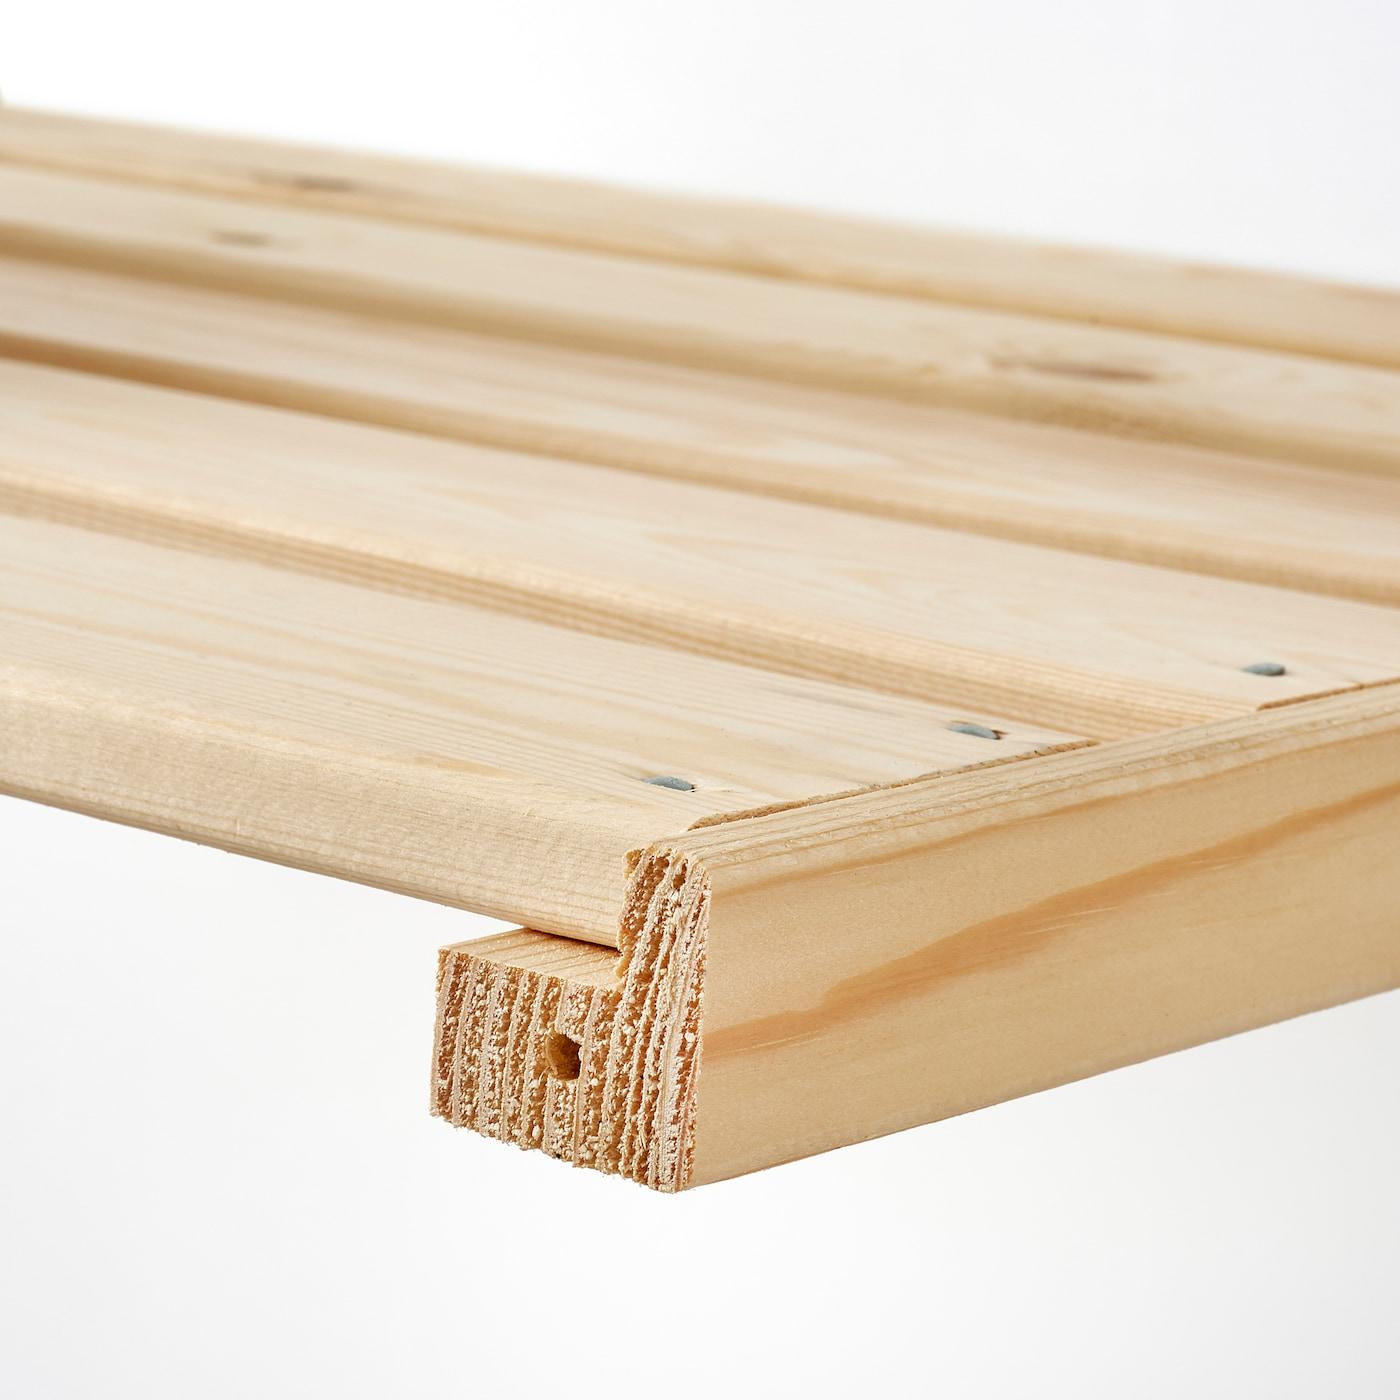 HEJNE Boden, 77x47 cm 2 Stück